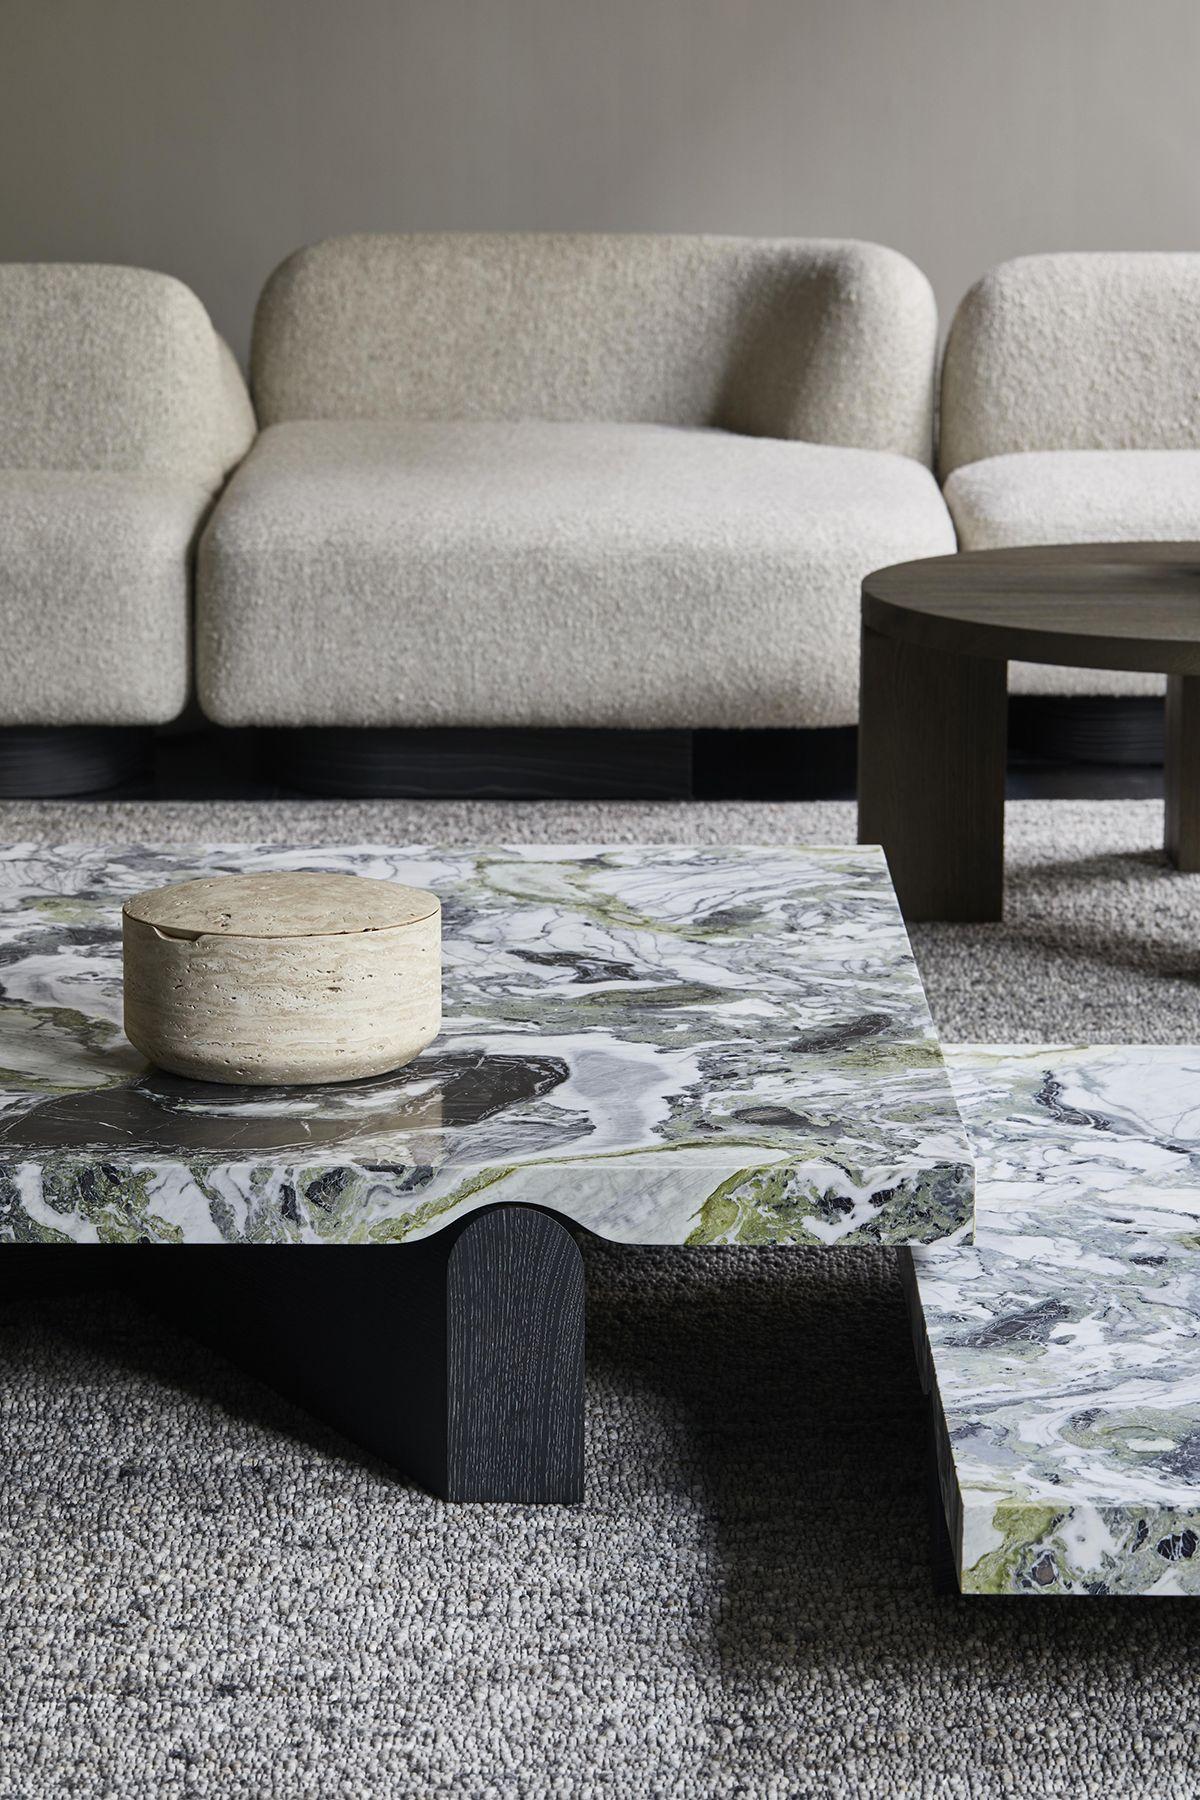 Delcourt Collection Pop Sofa Geo Low Table Edo Low Table Interior Furniture Furniture Table Furniture